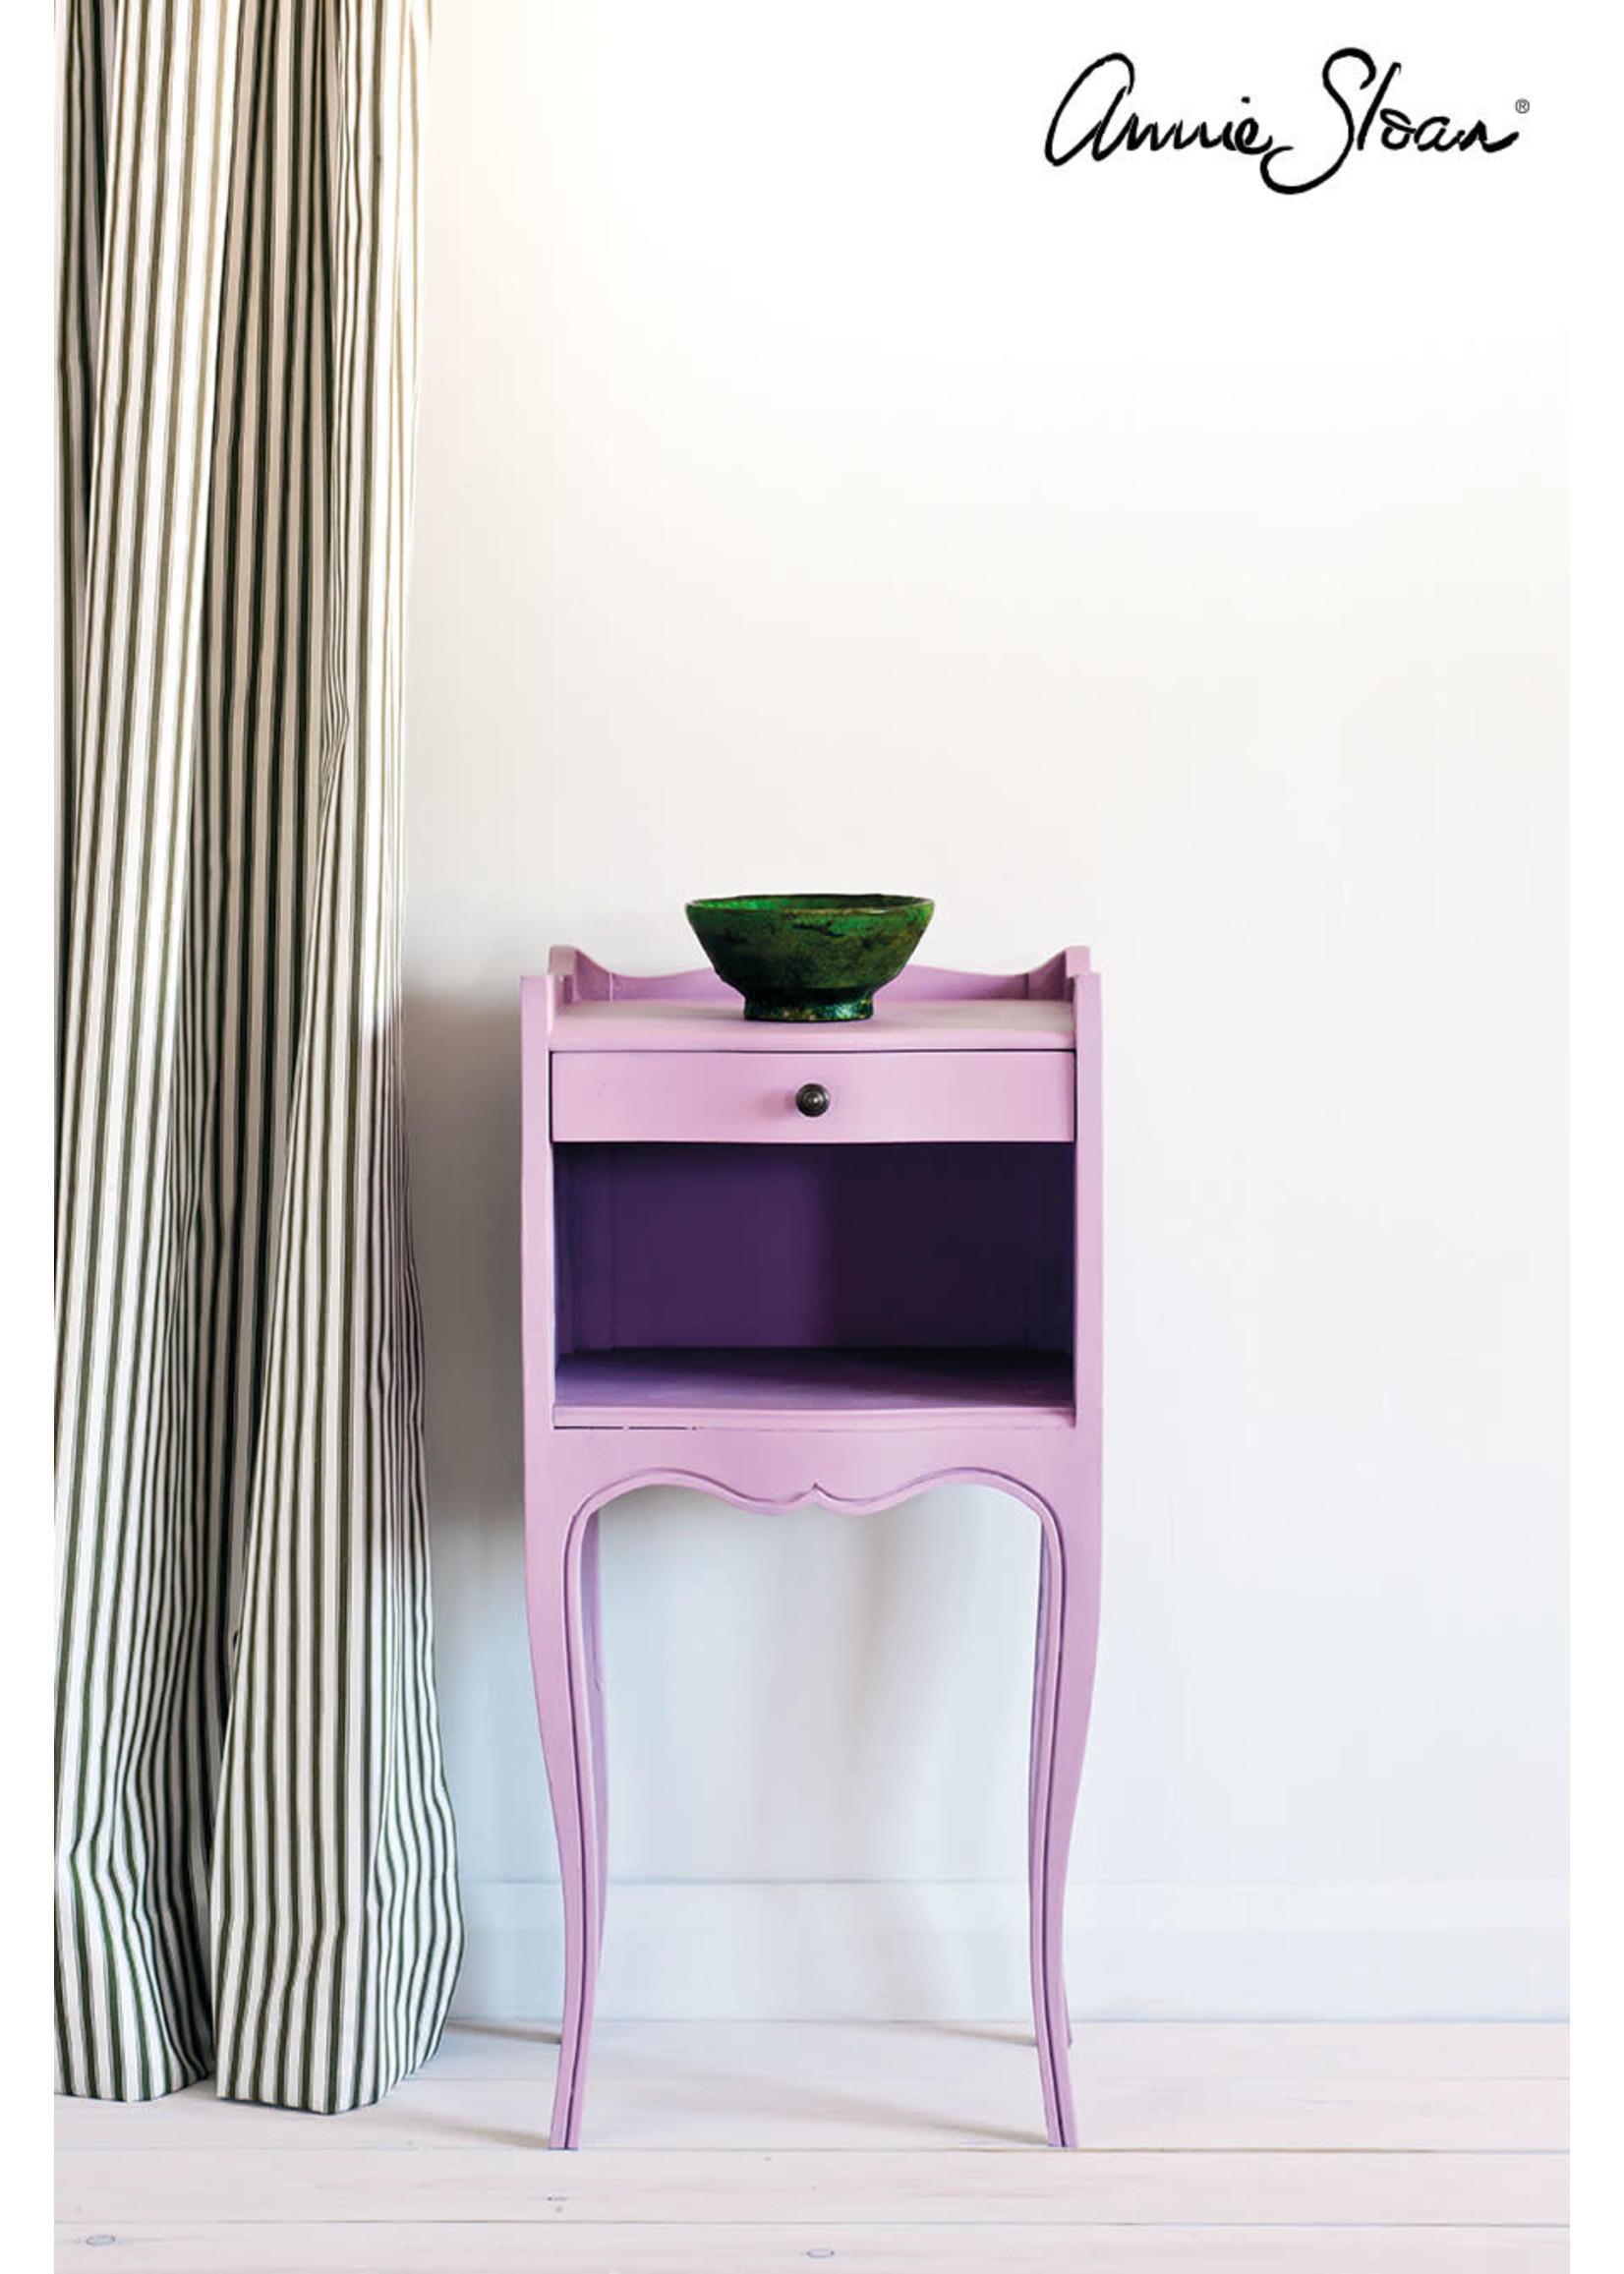 Annie Sloan Chalk Paint® Henrietta Annie Sloan Chalk Paint ®